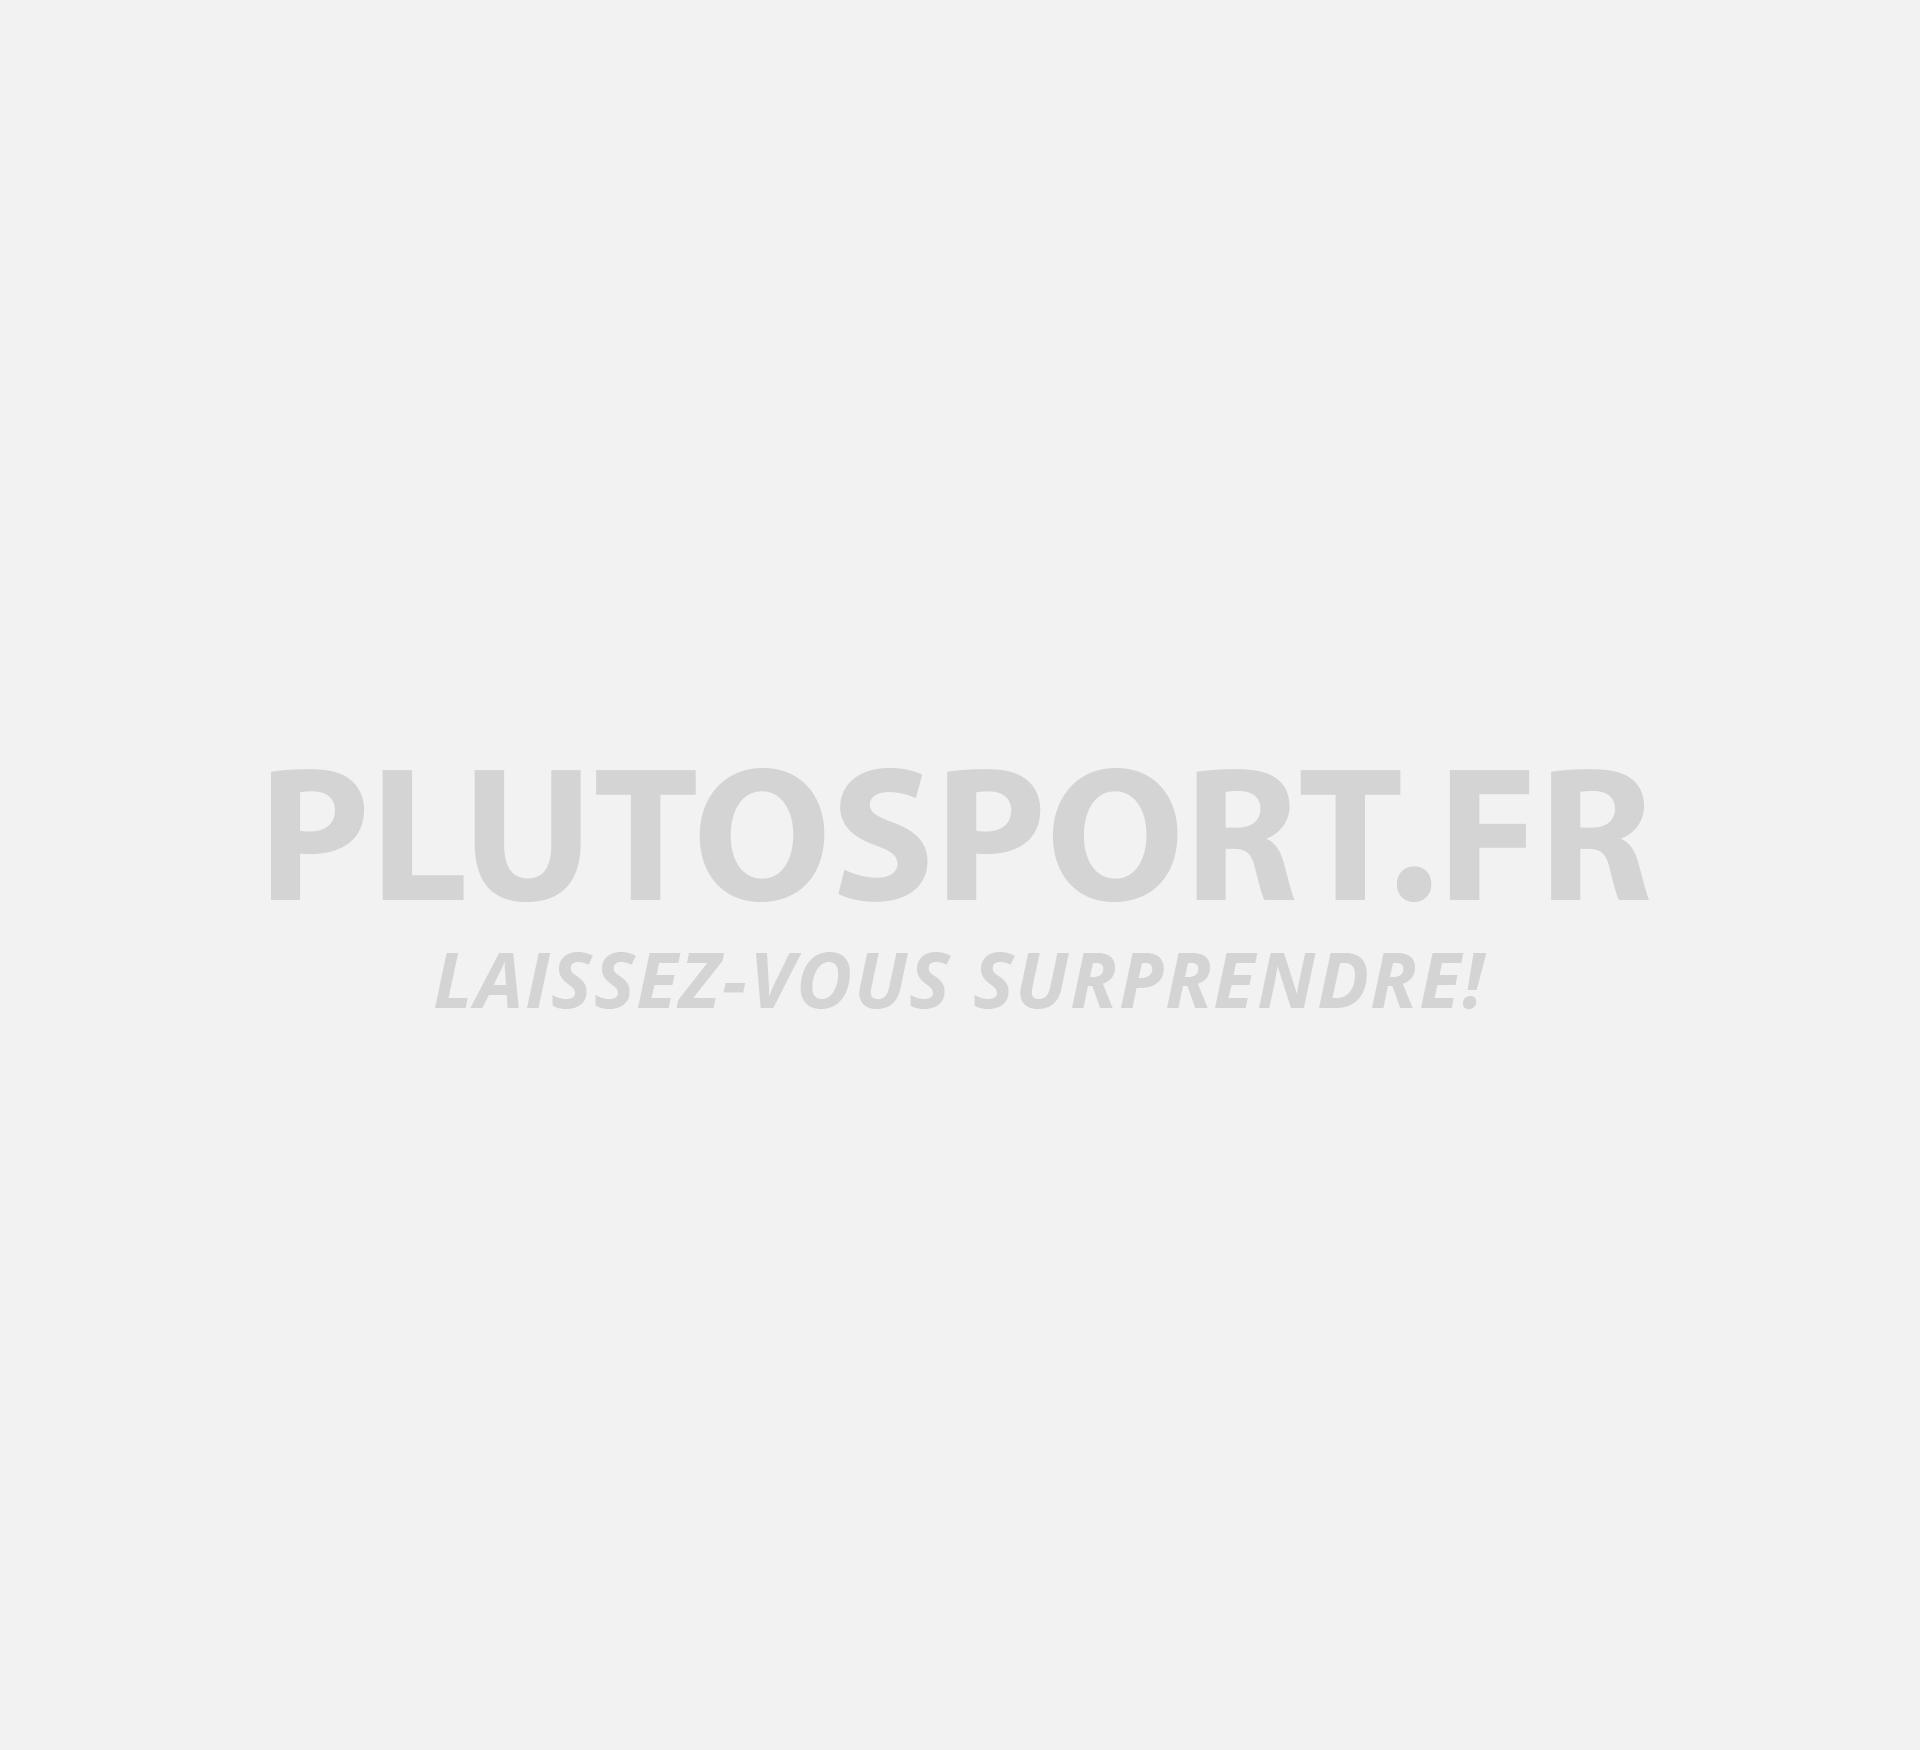 7b7b1642579b6 Le pantalon de jogging pour hommes Nike Team Club 19 Pant - Sweat ...